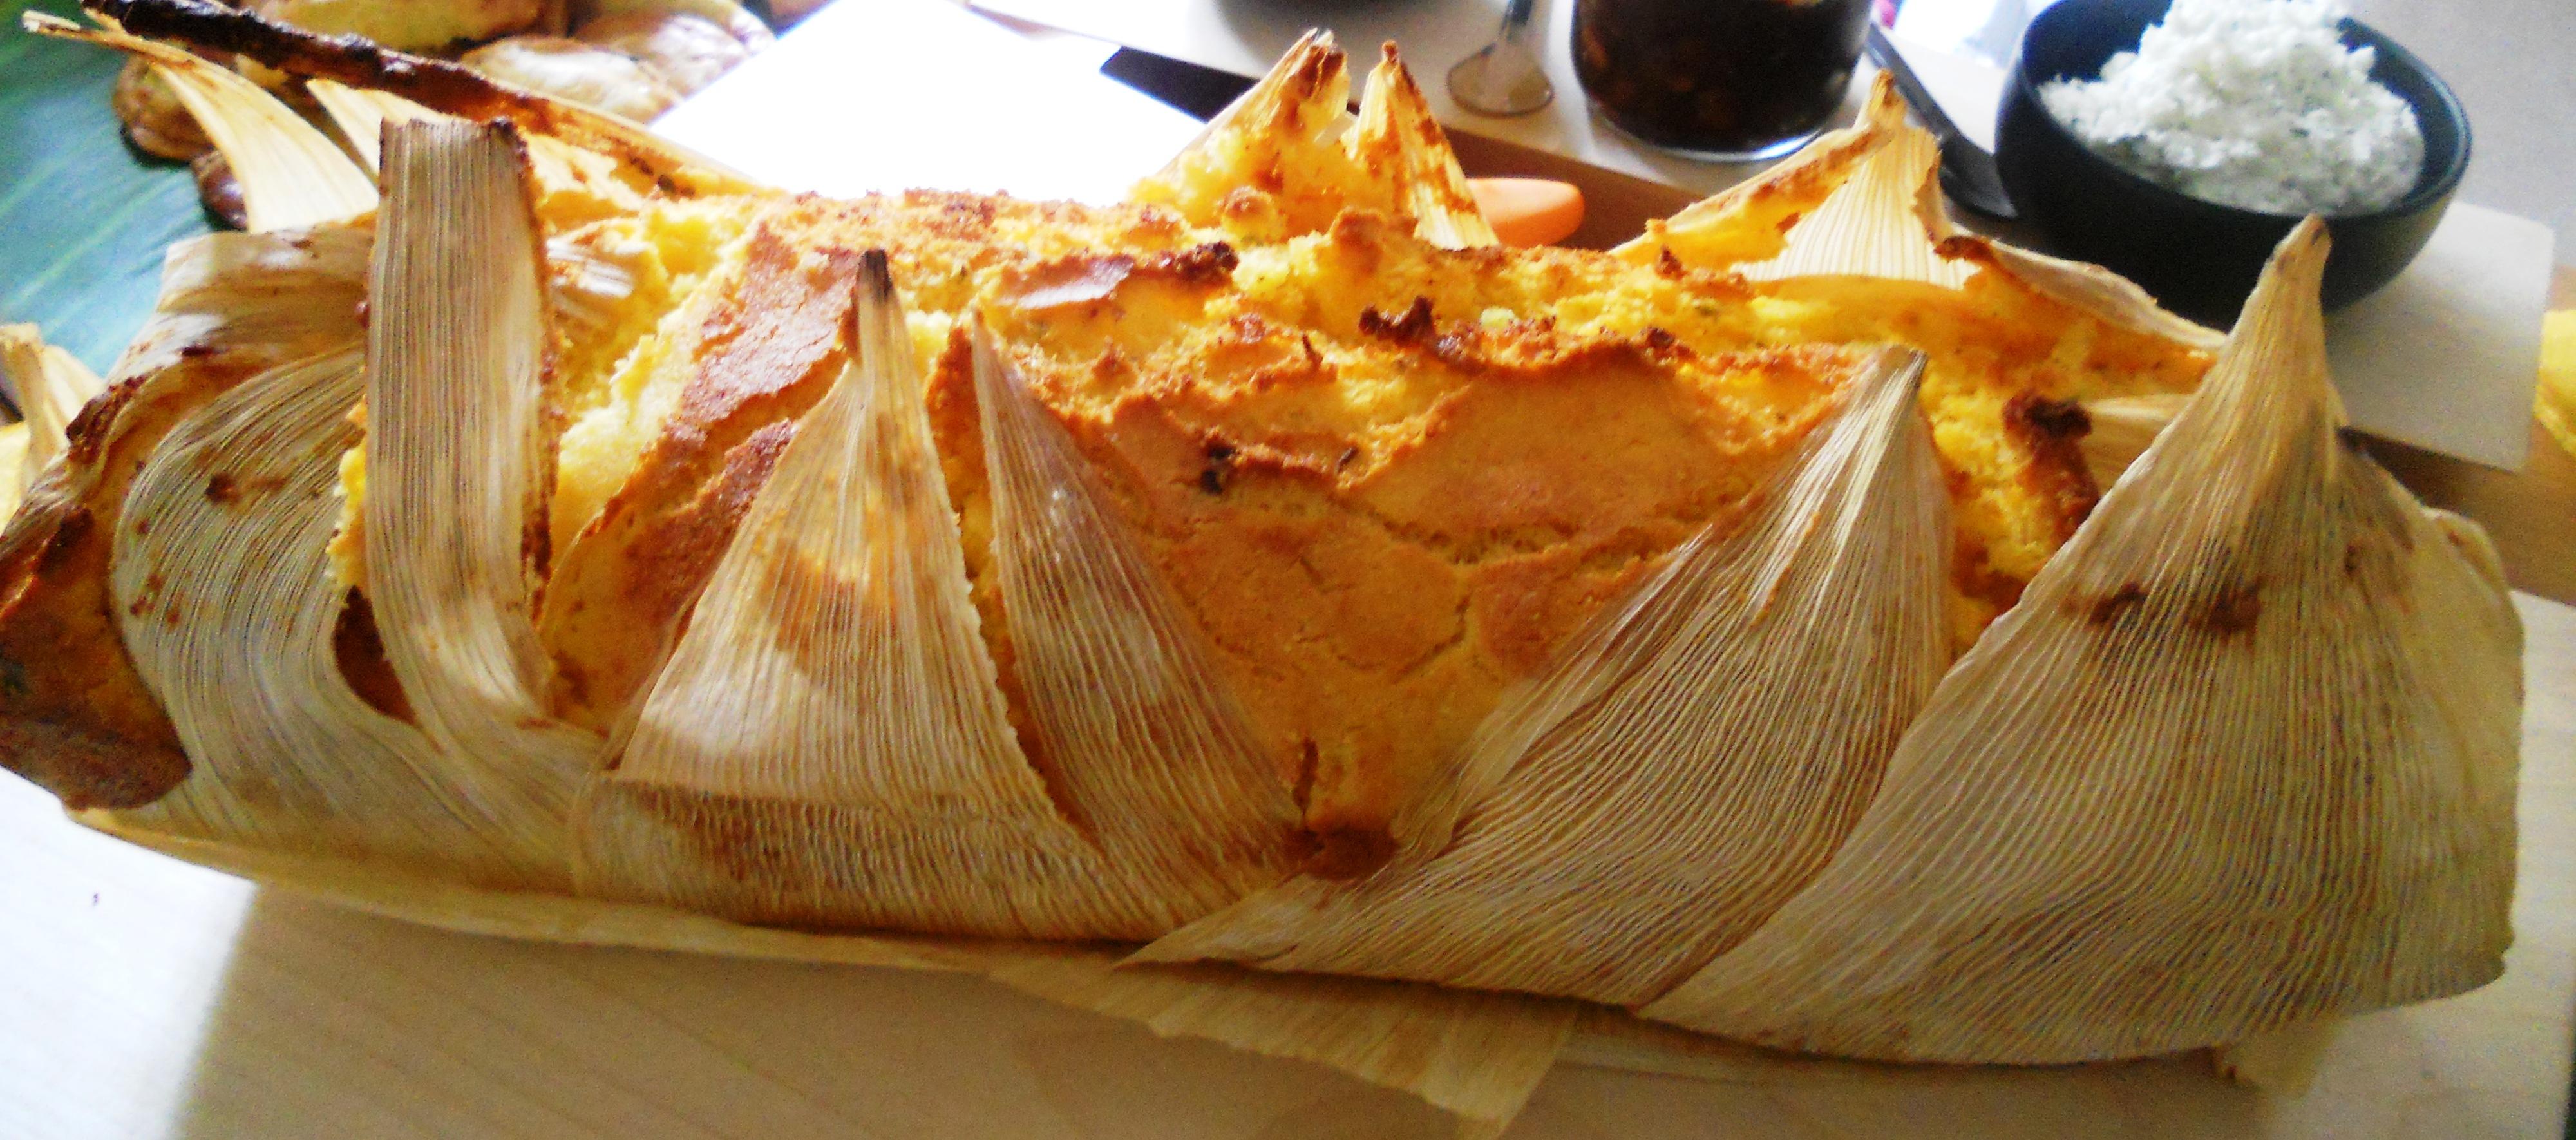 Italian Polenta Recipe • TURIN ITALY GUIDE